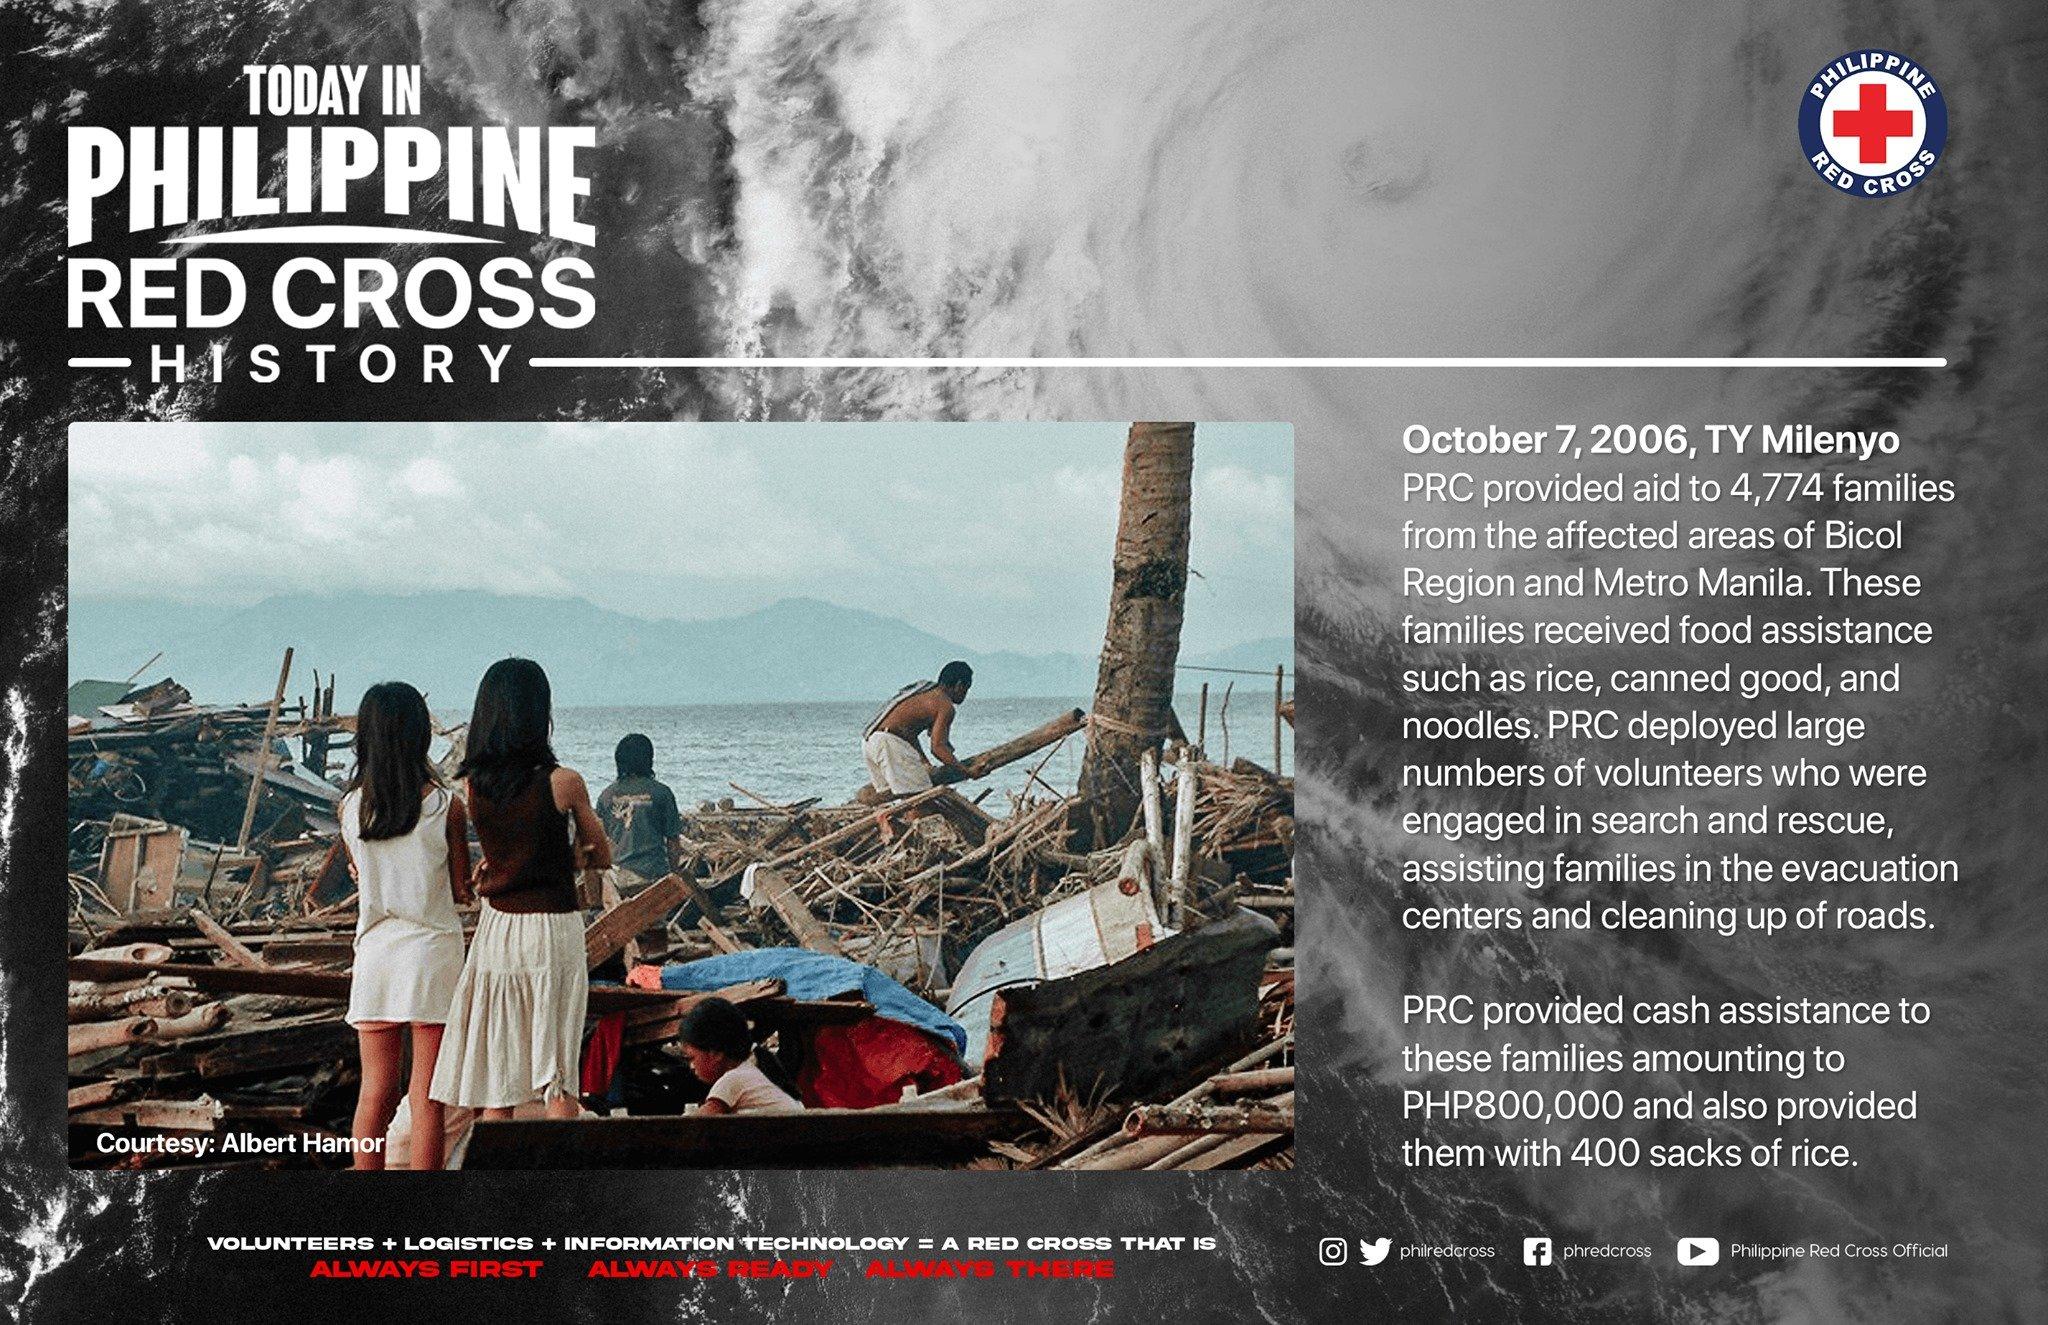 Philippine Red Cross Typhoon Milenyo Operations